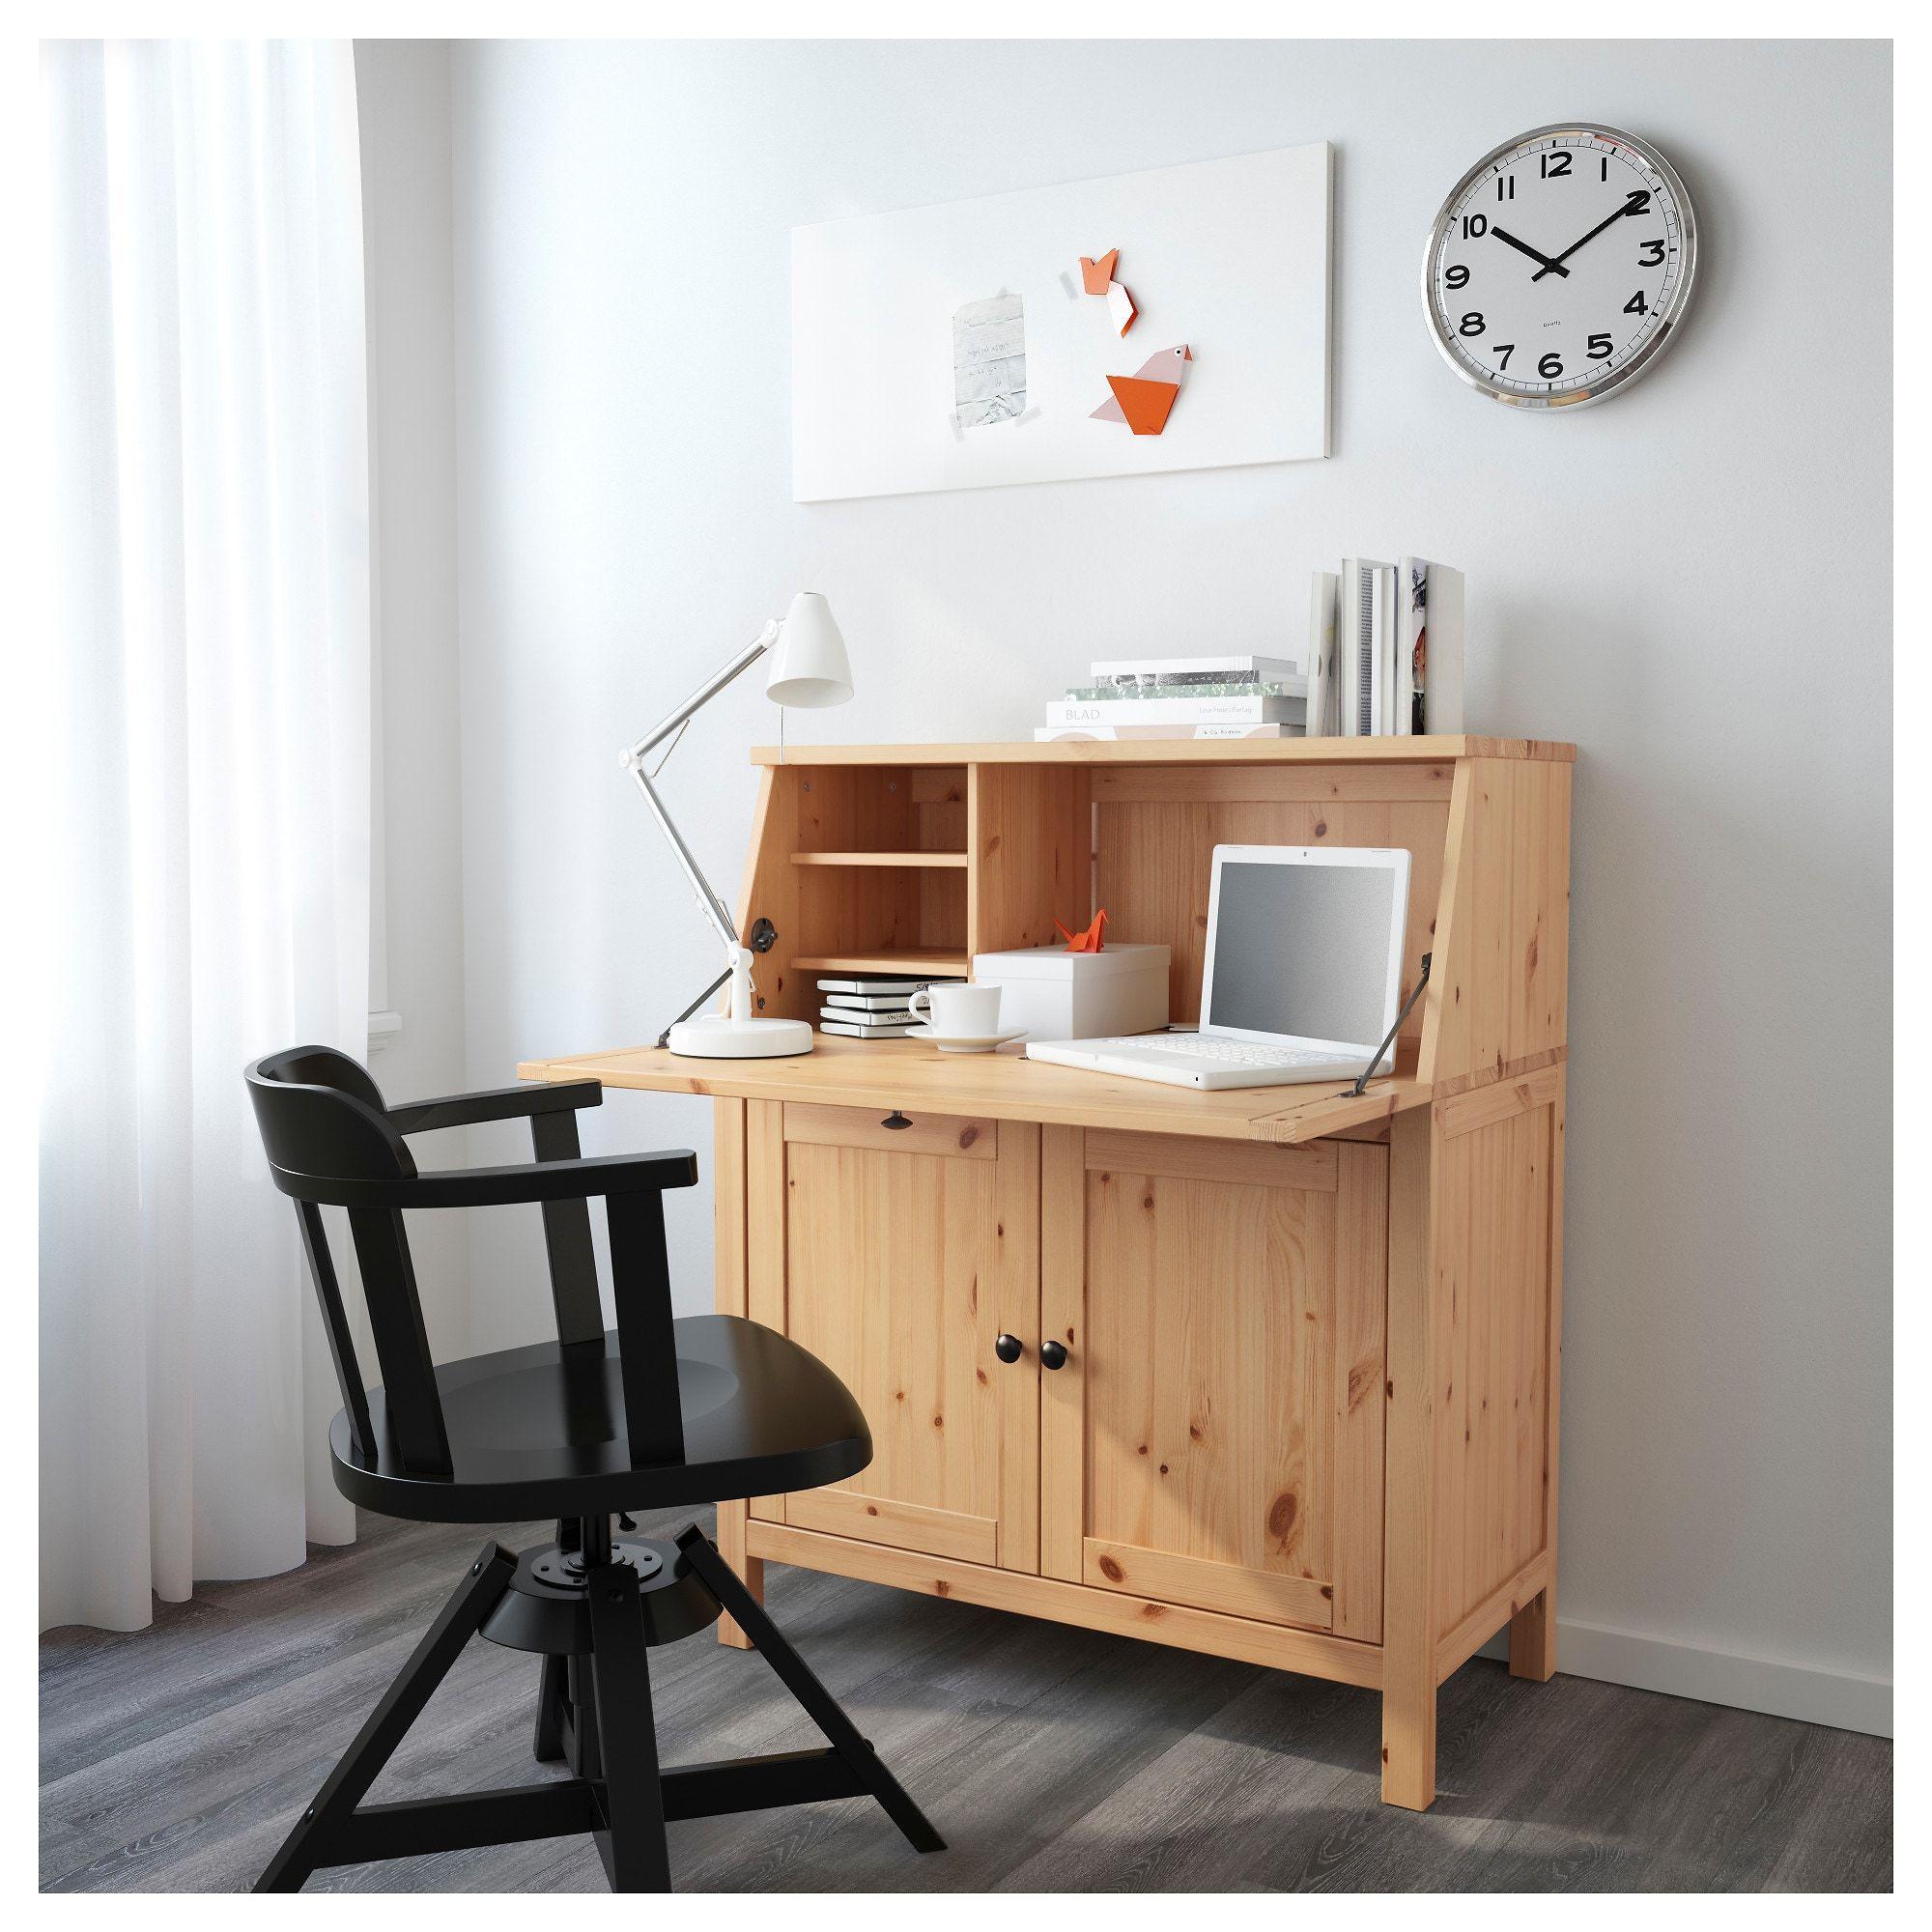 Hemnes Sekretär Hellbraun In 2019 Ikea Secretary Desk